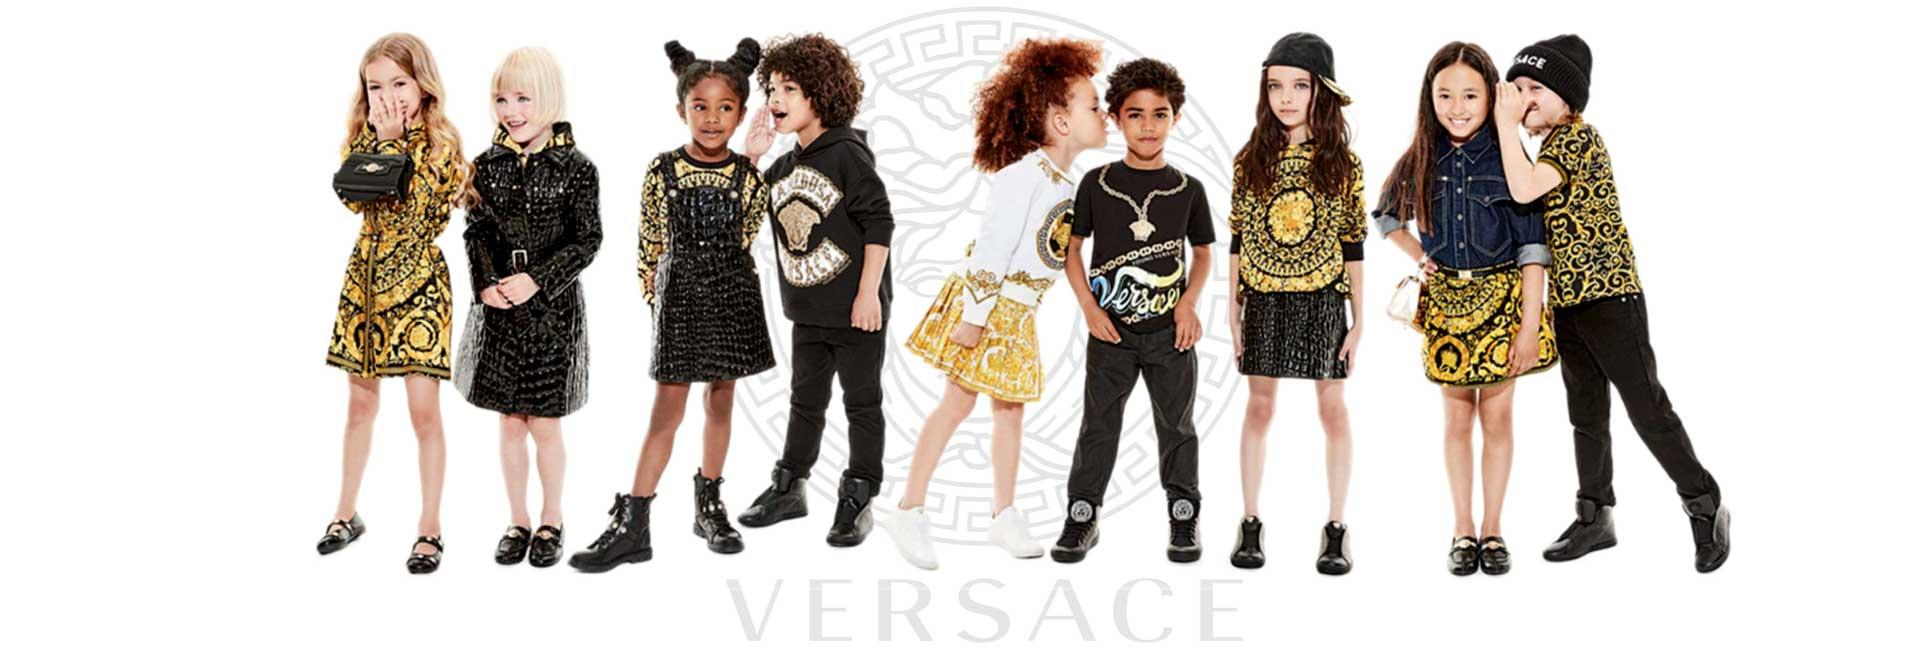 versace shq9 1 - جیانیورساچه versace